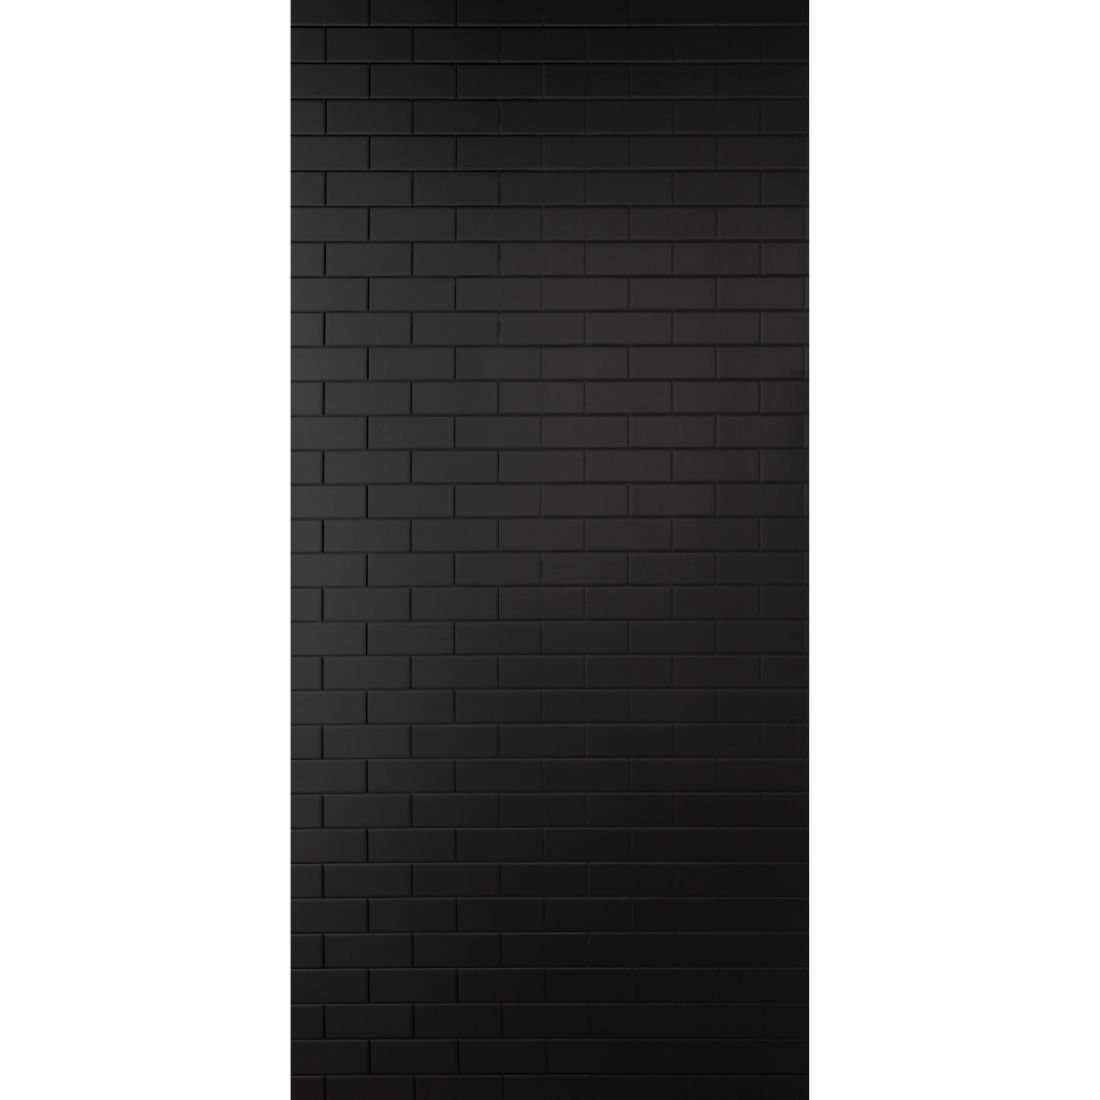 Aqua Wall Lining Panel Black Gloss Subway Tile 2400 x 1200 x 4.5mm